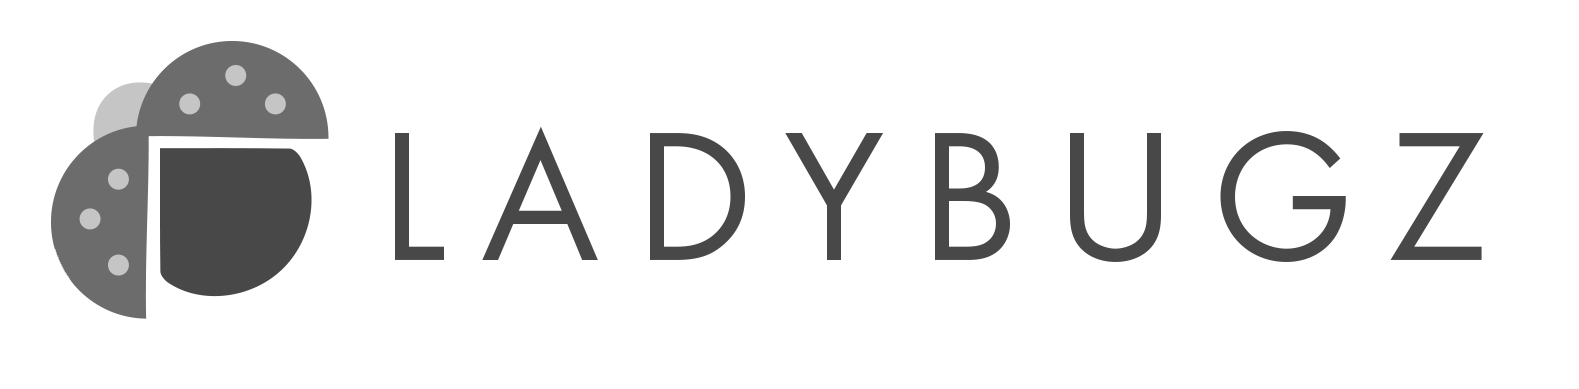 Ladybugz.png